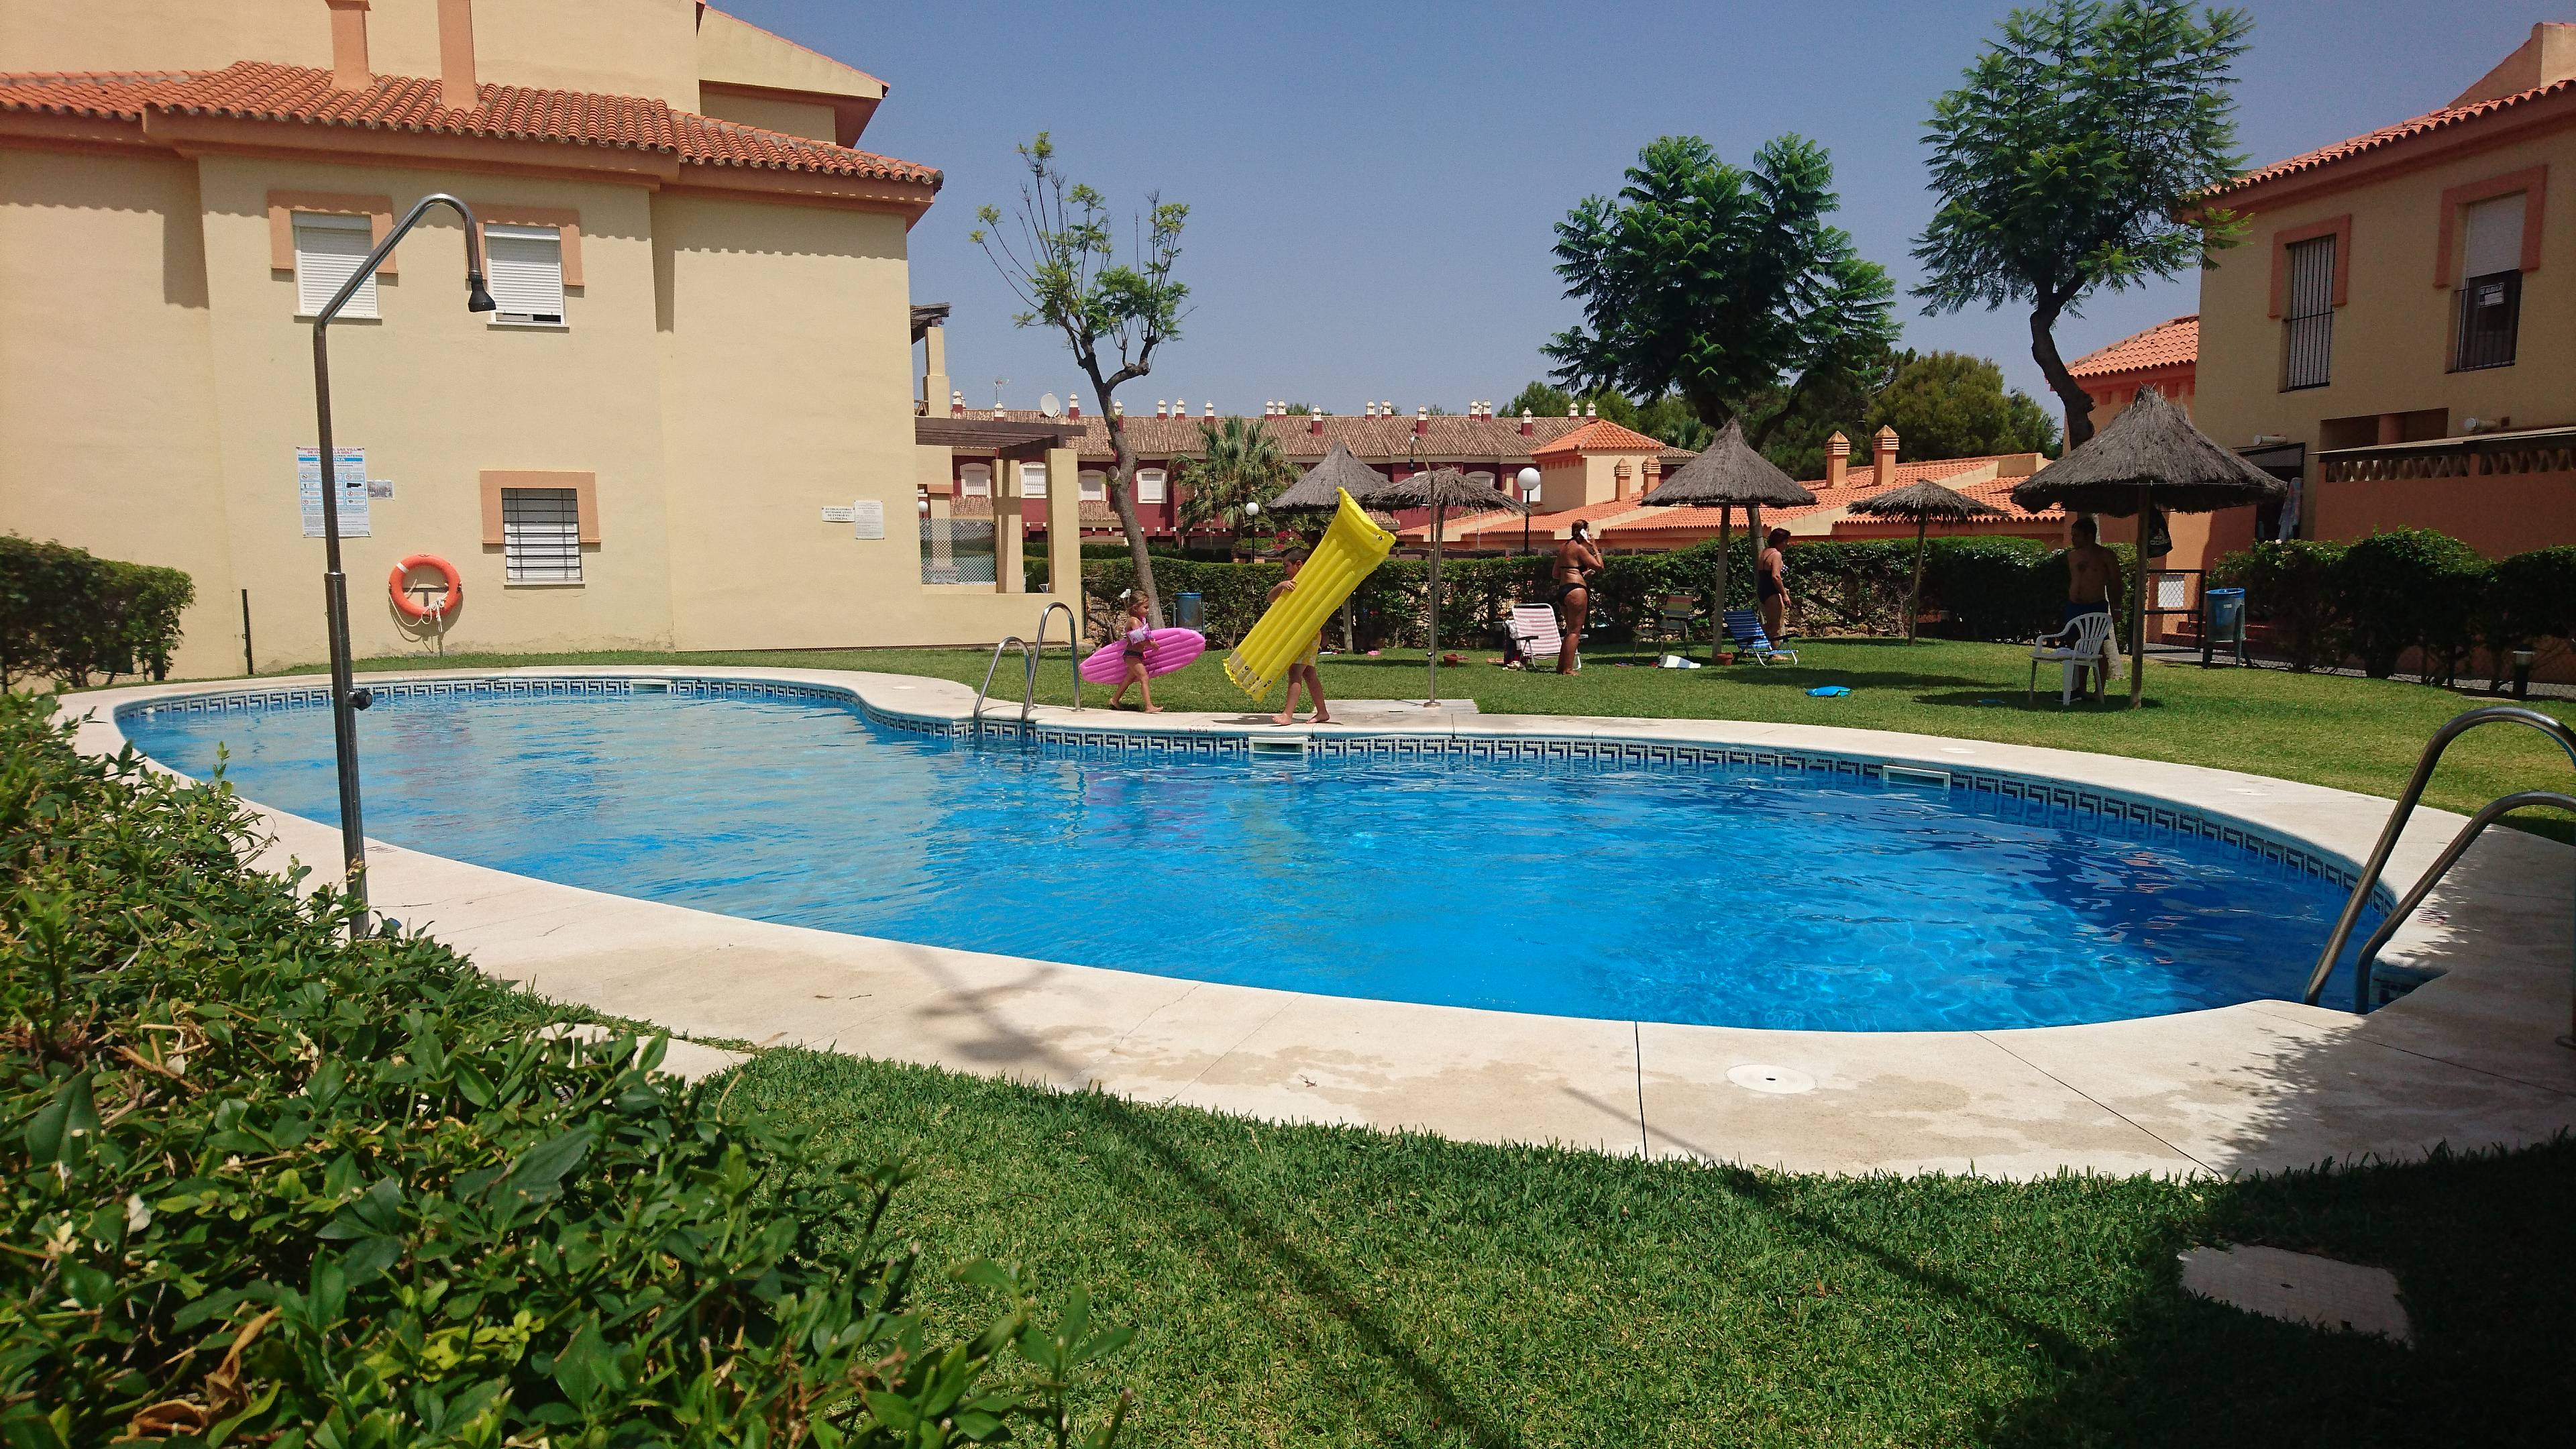 Apartamento para alugar a 500 m da praia islantilla lepe - Rentalia islantilla ...